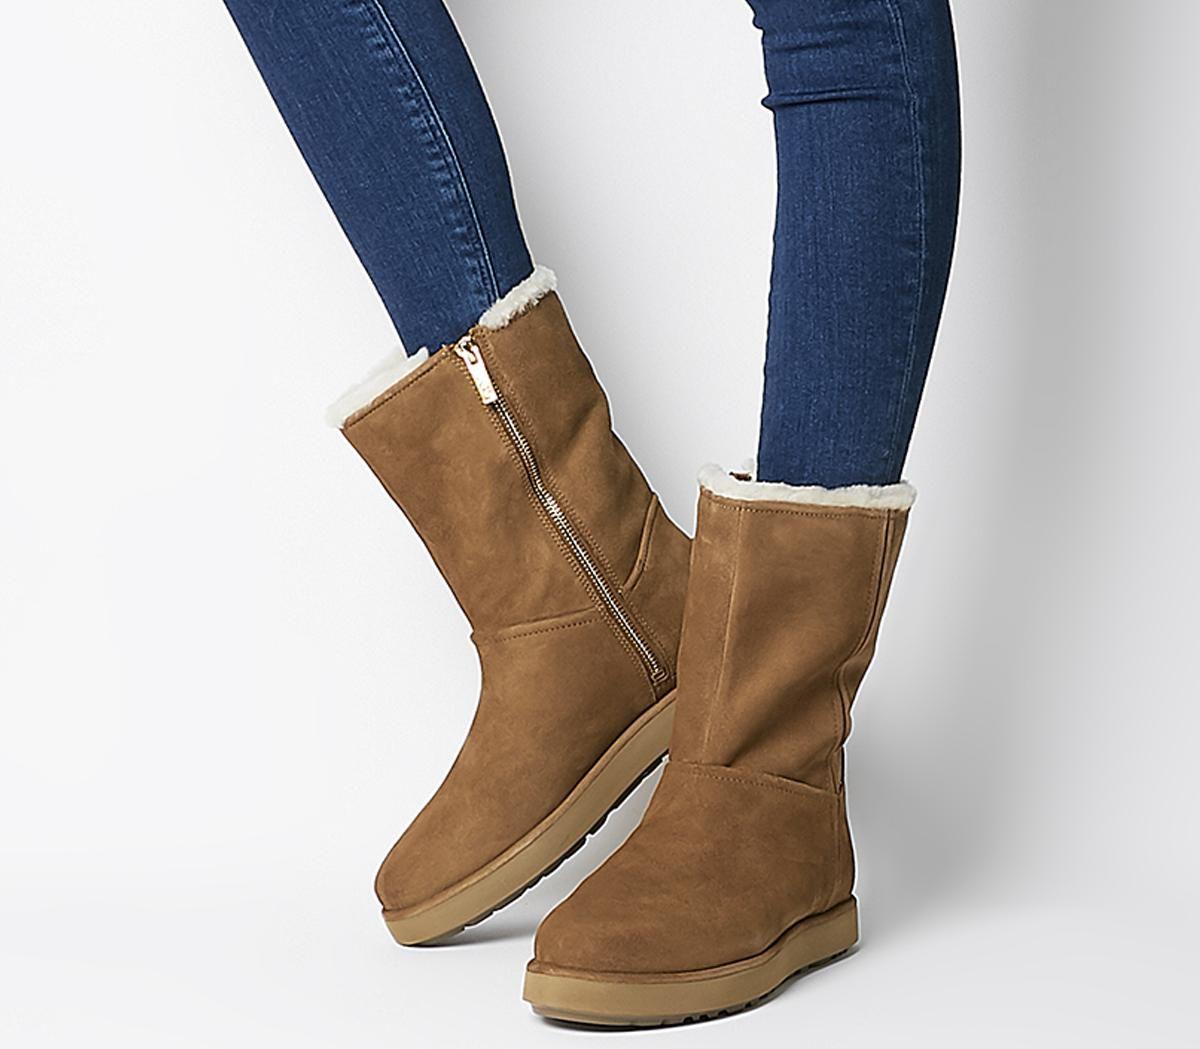 Ugg Classic Short Blvd Boots Bruno Online Exclusives Fur Boots Fashion Boots Ugg Classic Short